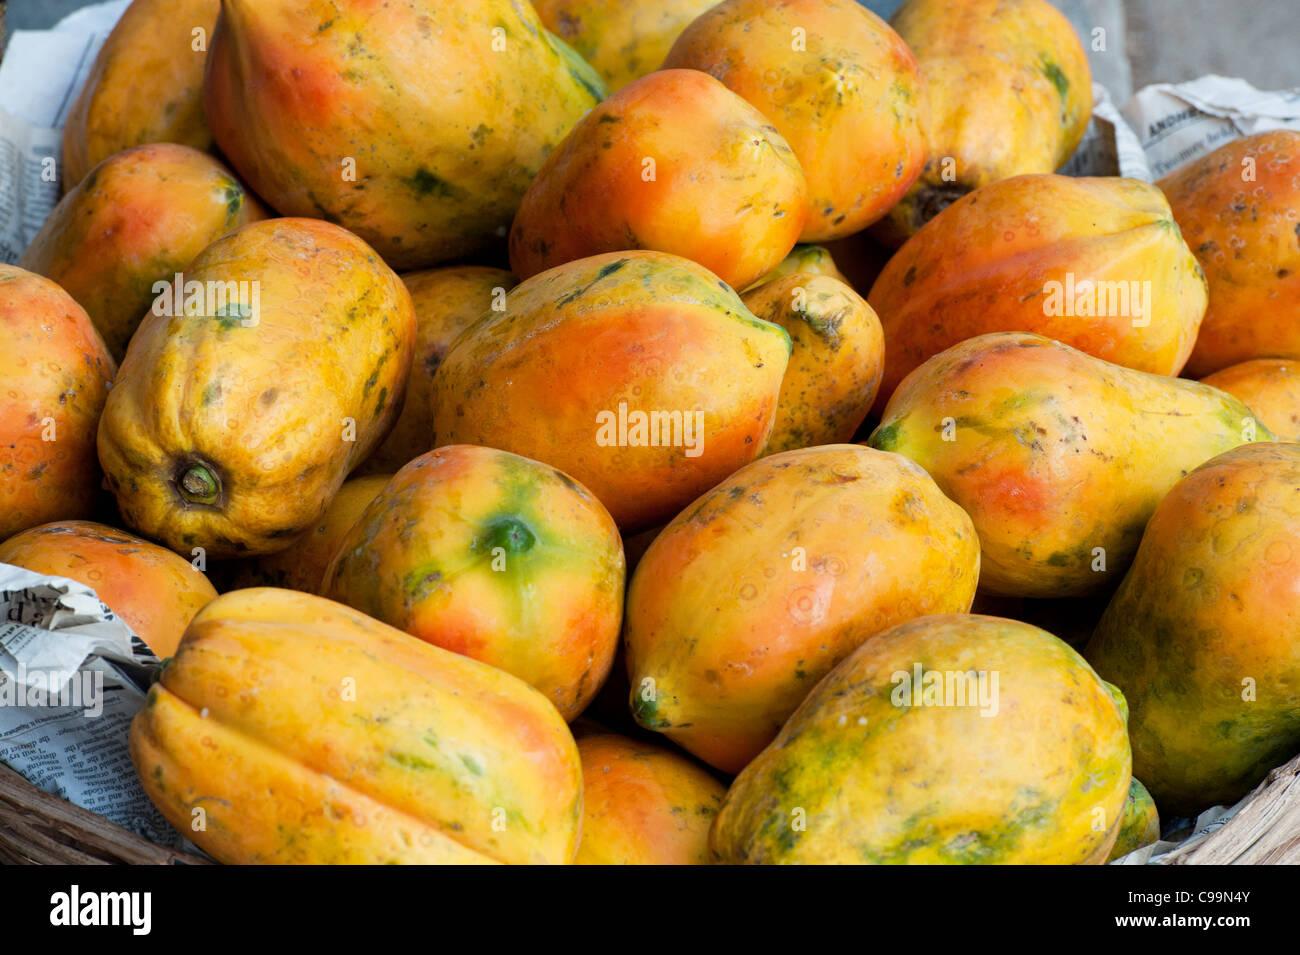 Papaya for sale at an Indian market - Stock Image